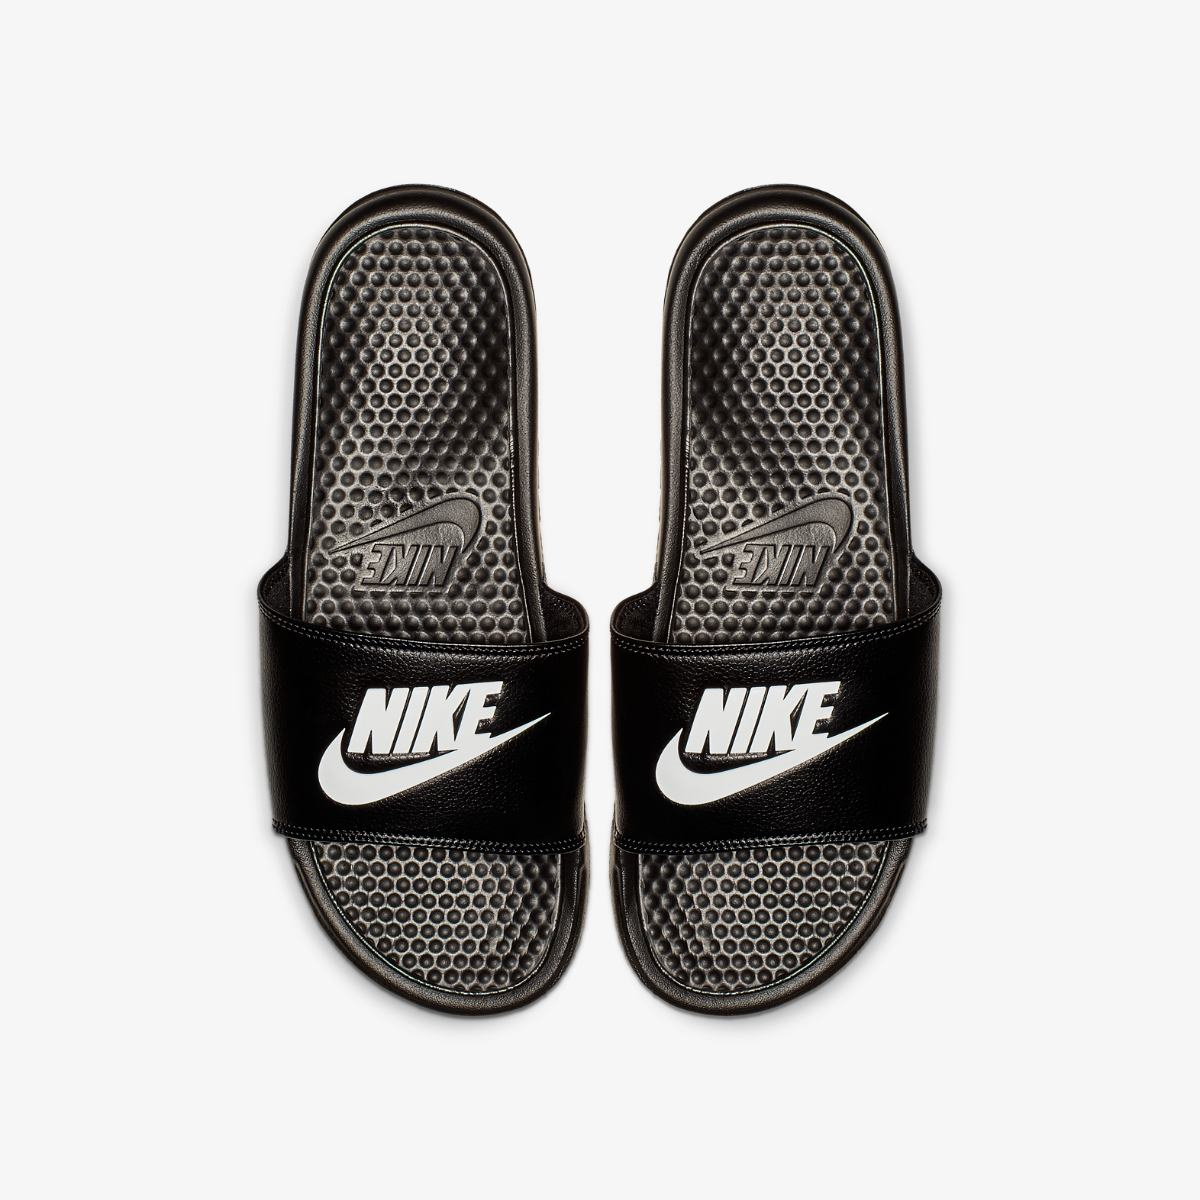 93d06db9 Тапочки Nike BENASSI JDI 343880-090 купить | deltasport.ua